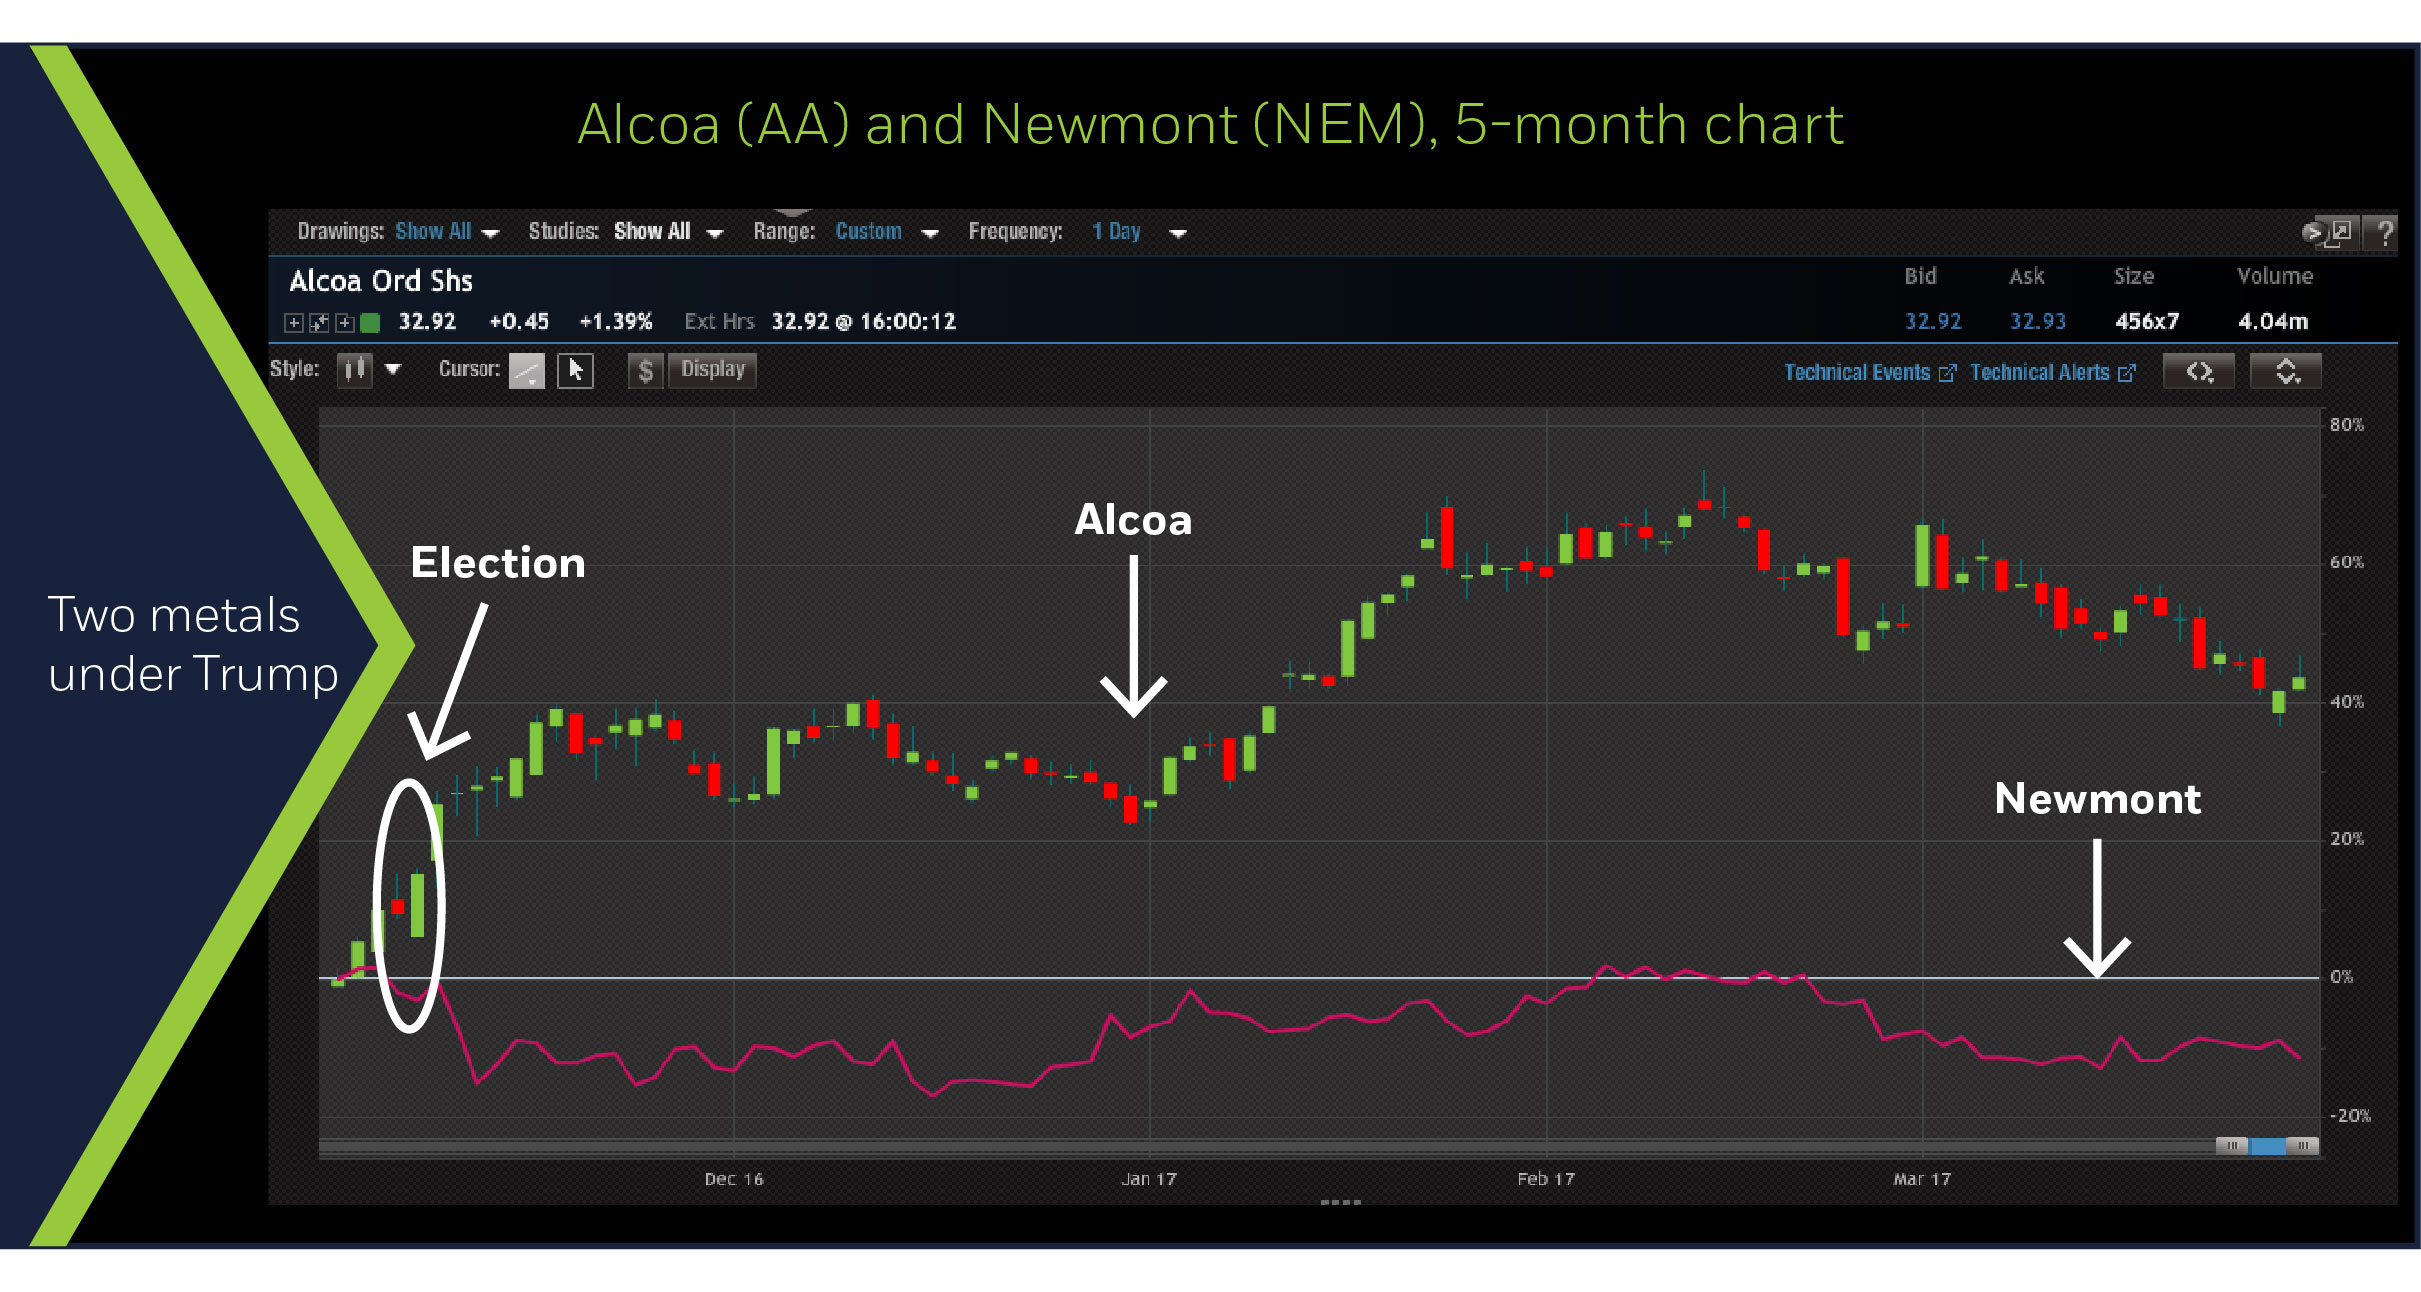 Alcoa vs. Newmont Mining, 5-month chart